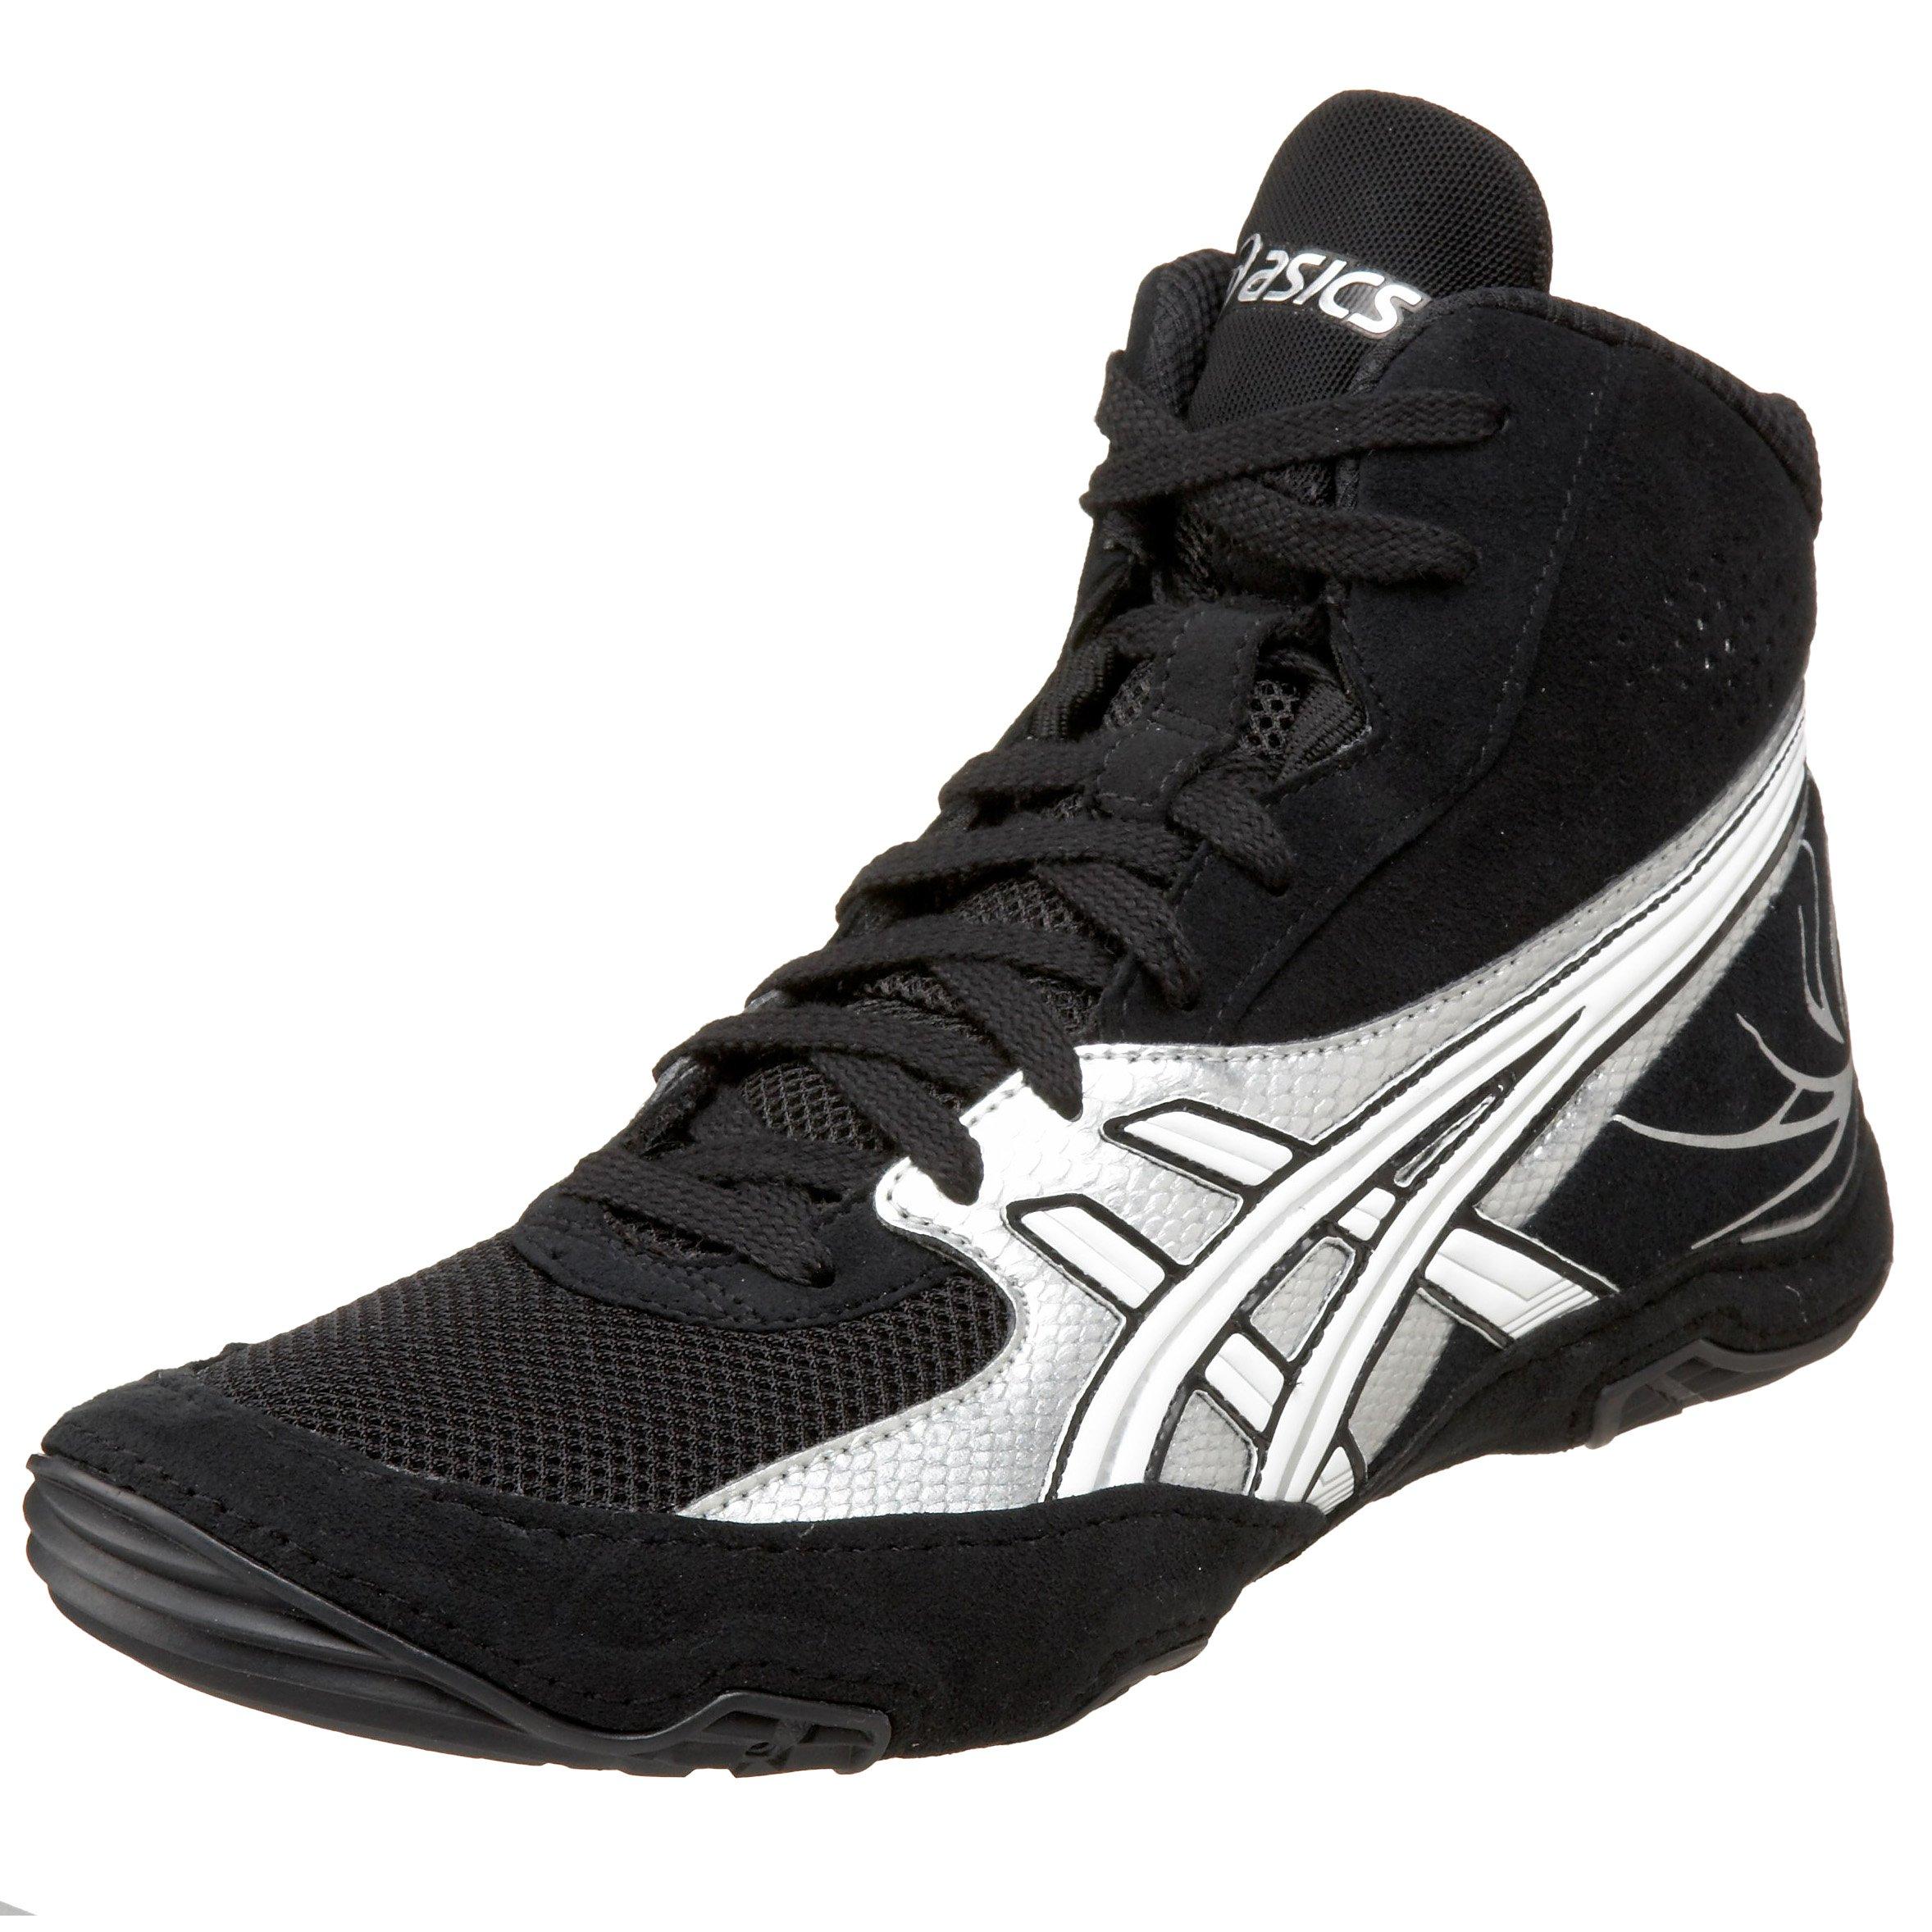 ASICS Men's Cael Wrestling Shoe,Black/Silver/White,11.5 D US by ASICS